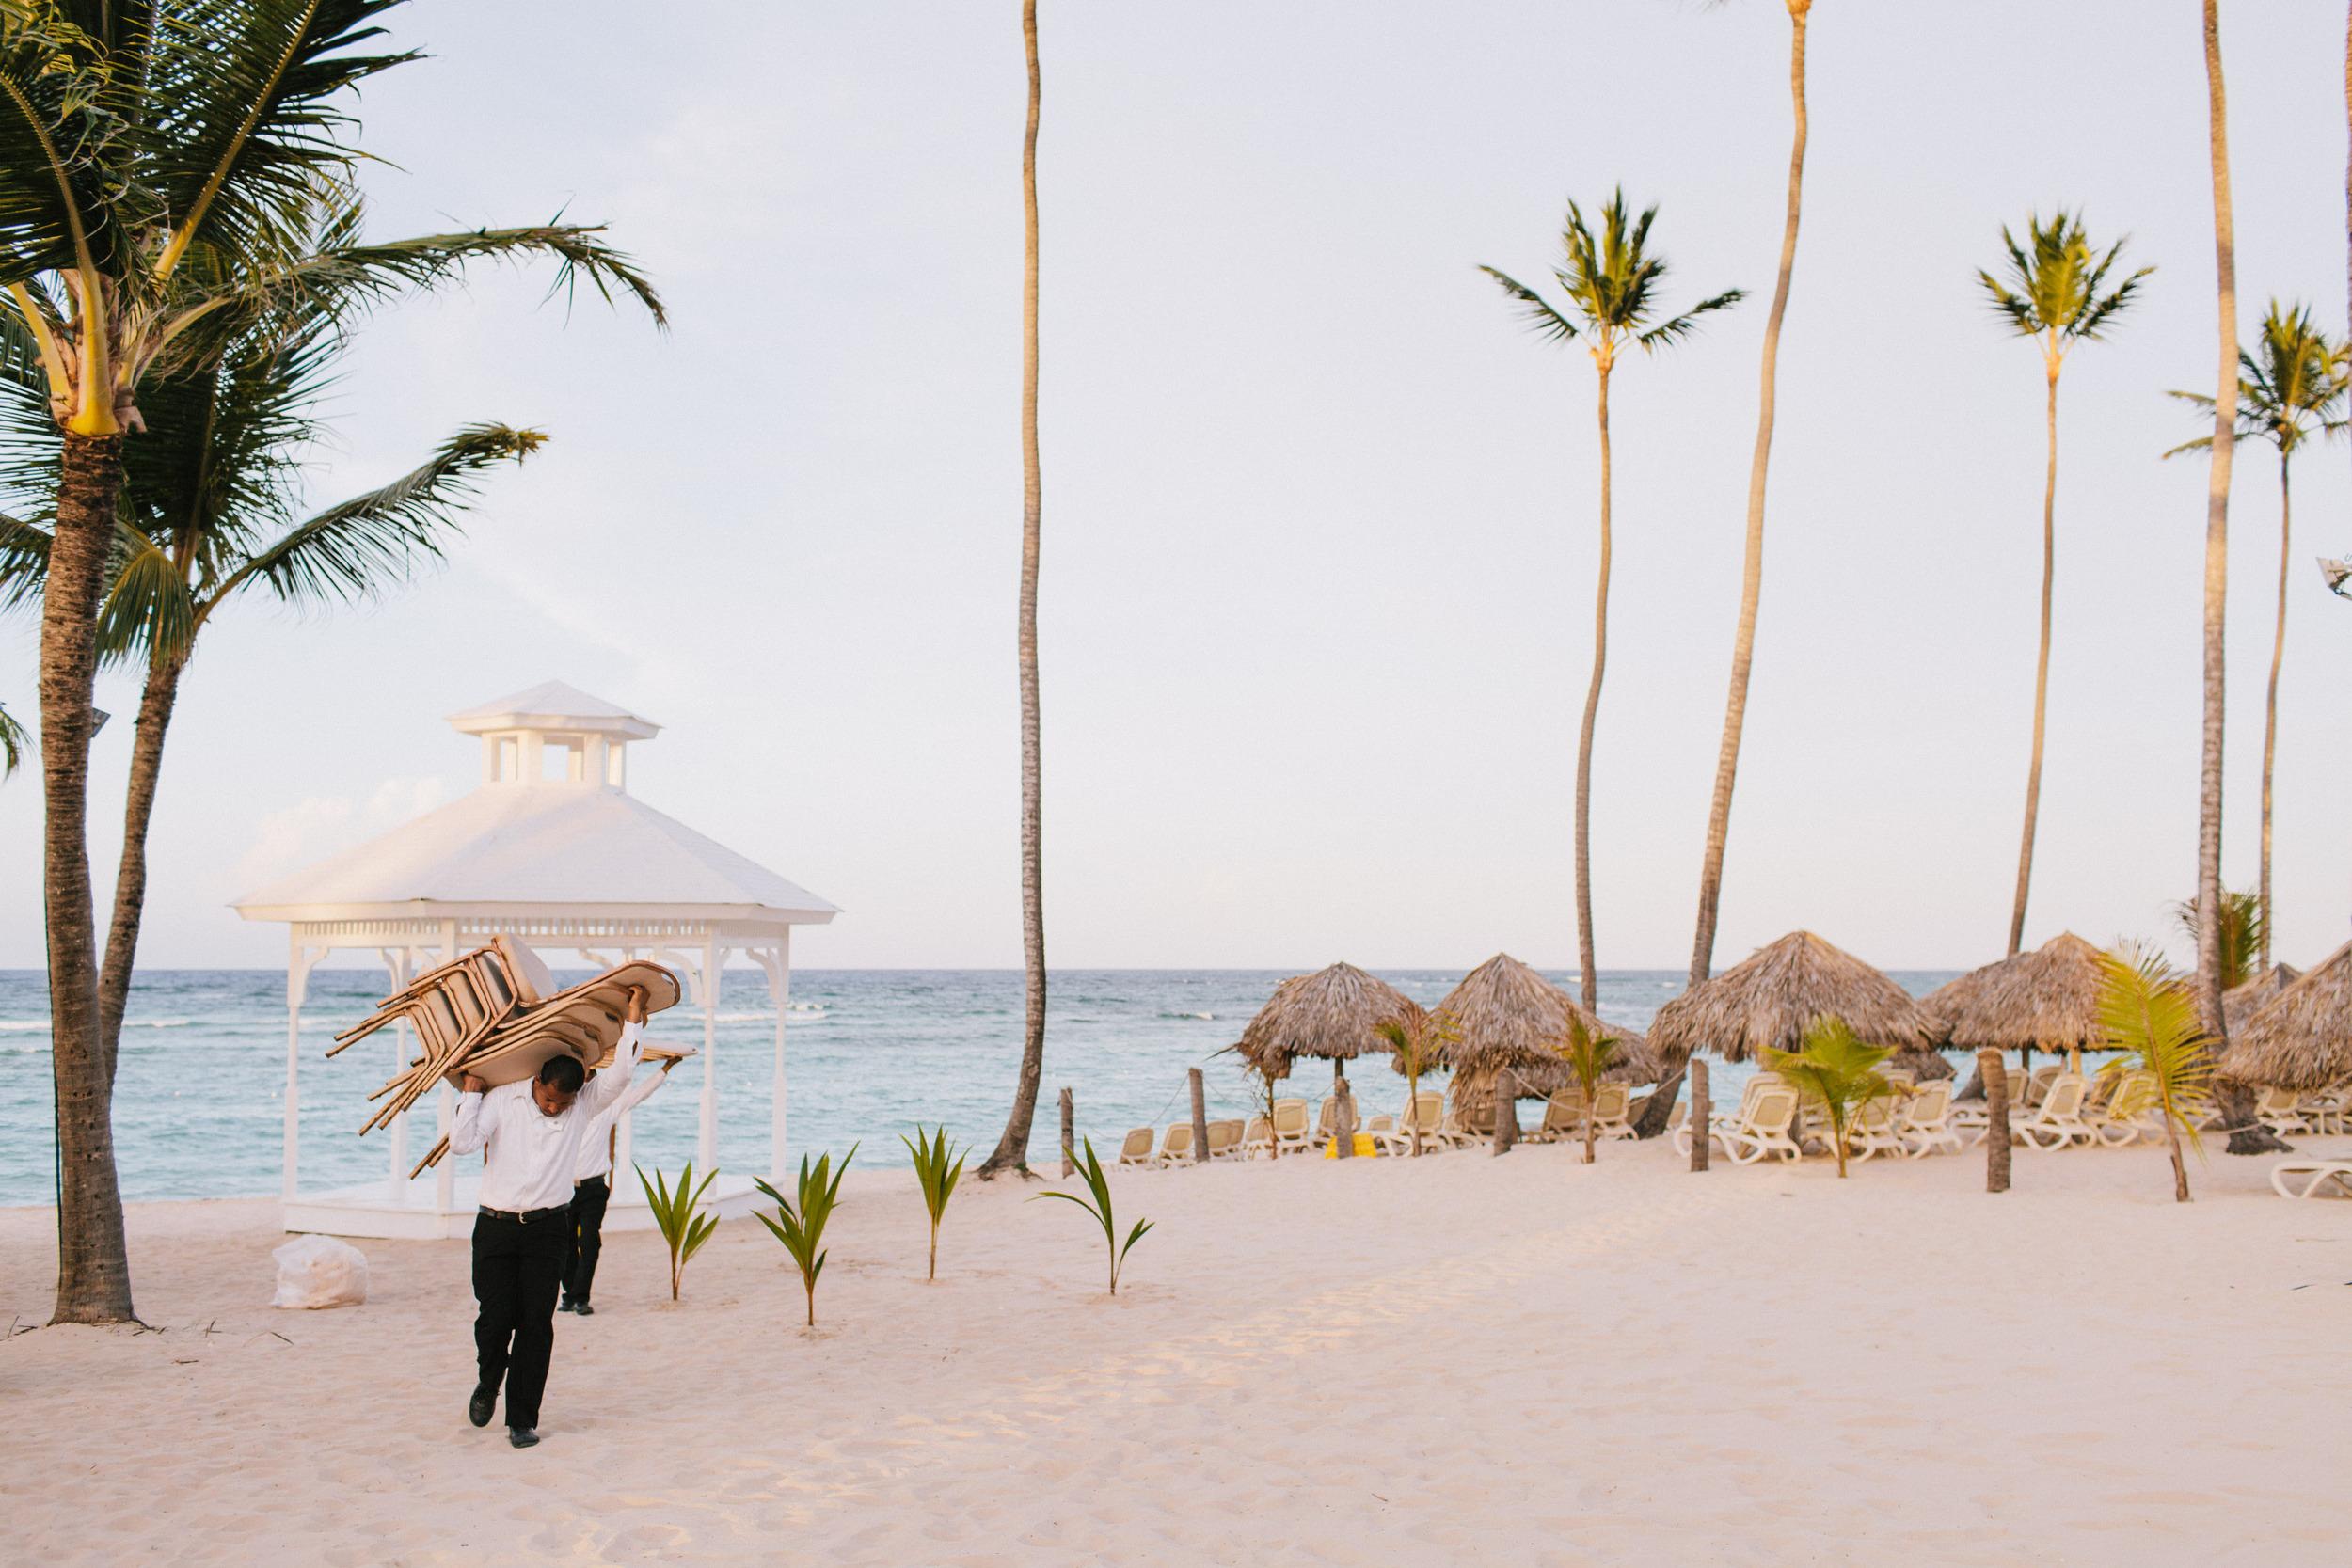 michael-rousseau-photography-dominican-republic-destination-wedding-cara-jason-colonial-majestic-dominican-republic012.jpg